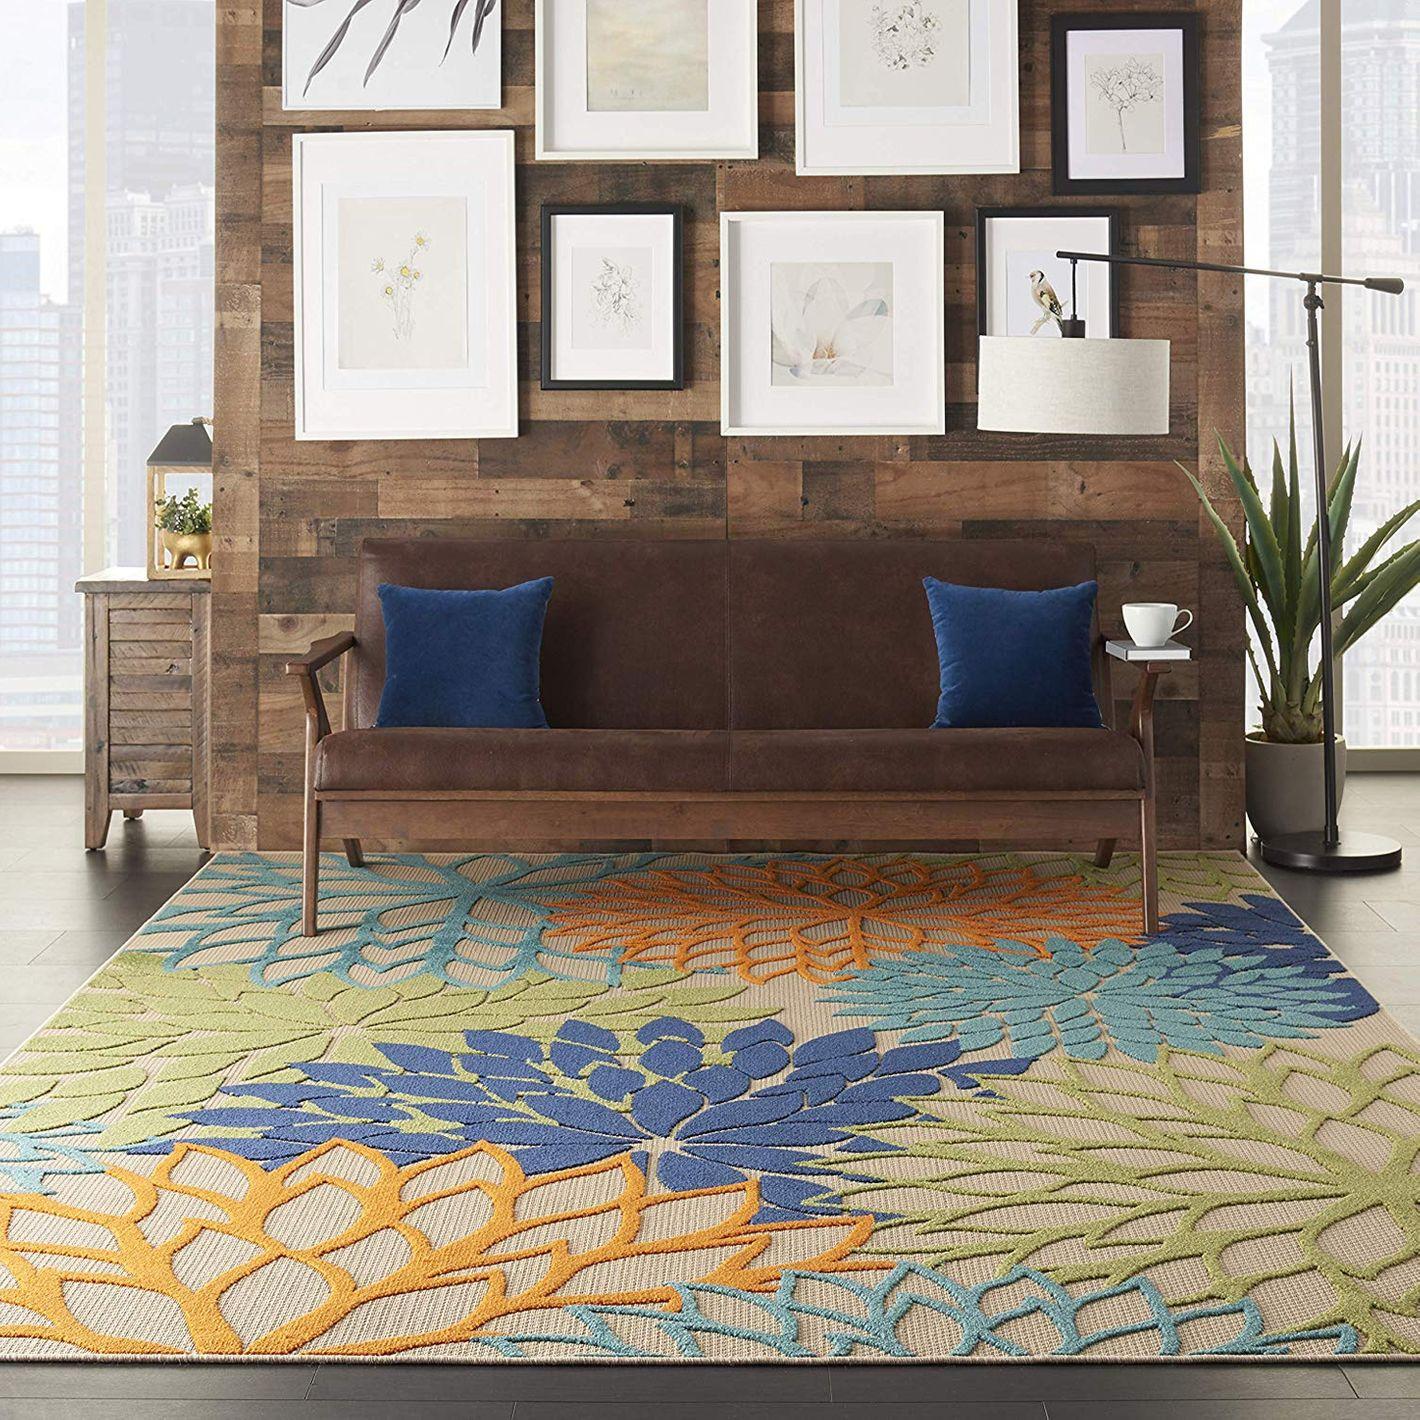 Nourison Aloha ALH05 Indoor/Outdoor Floral Blue Multicolor Area Rug